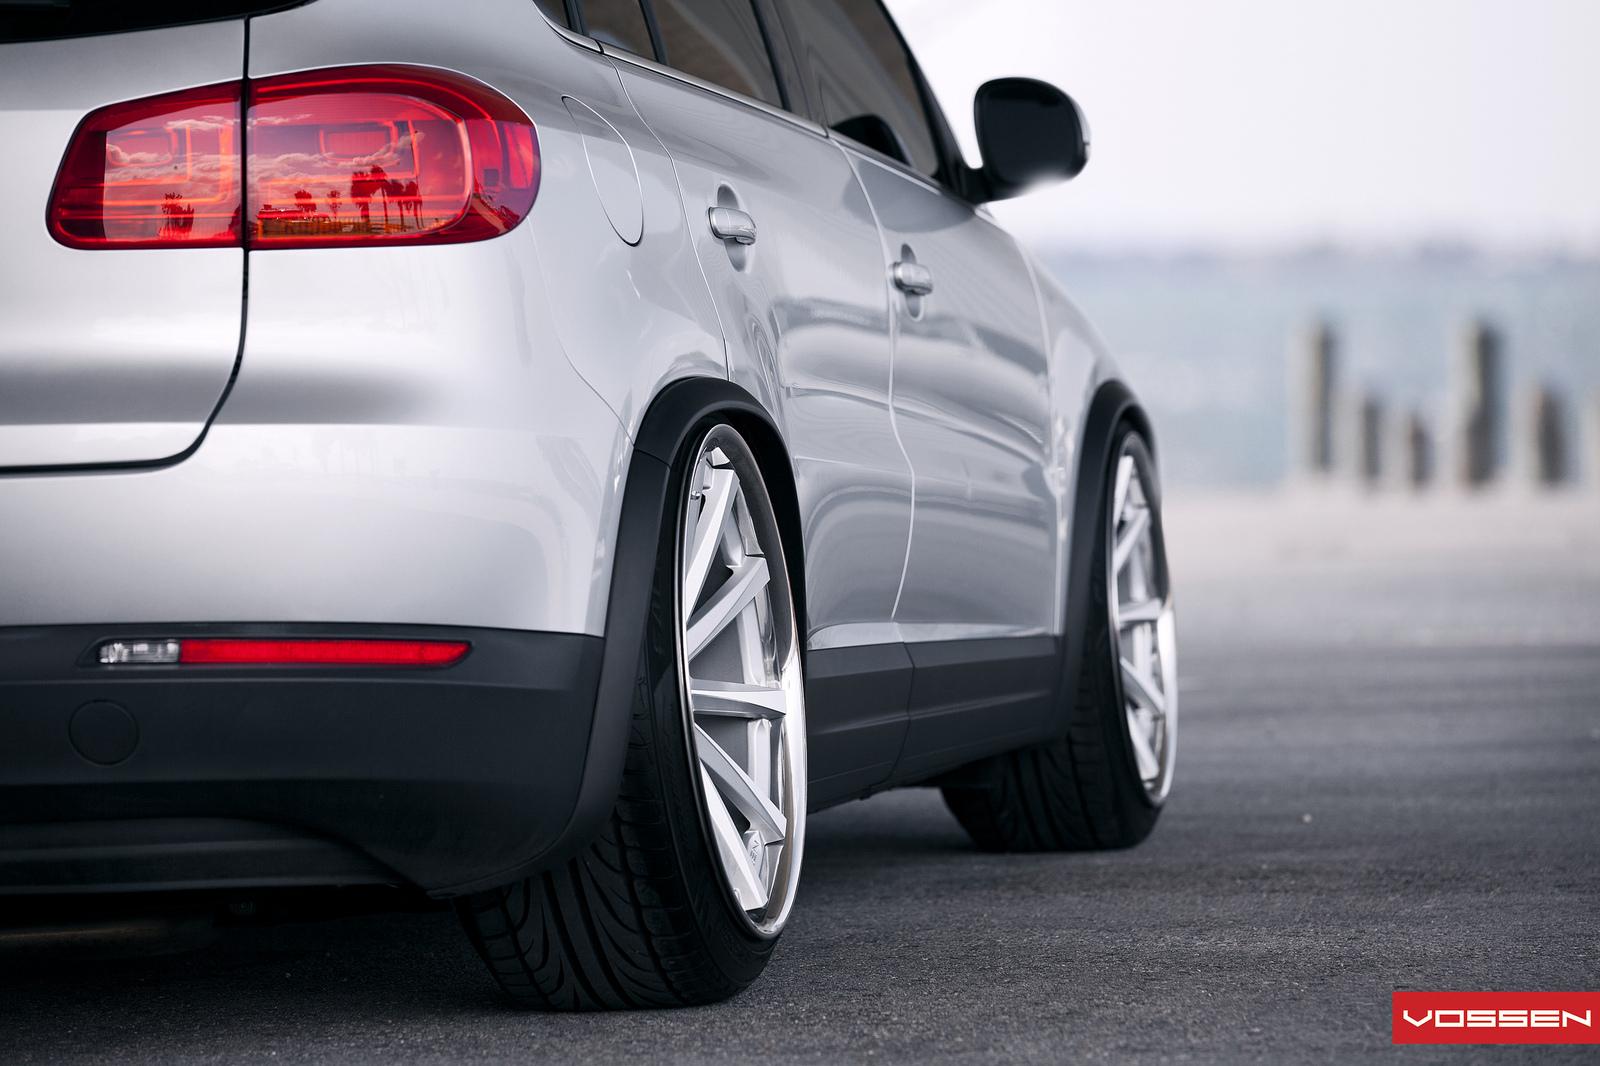 VW Tiguan Bagger on 20-Inch Vossen Wheels - autoevolution